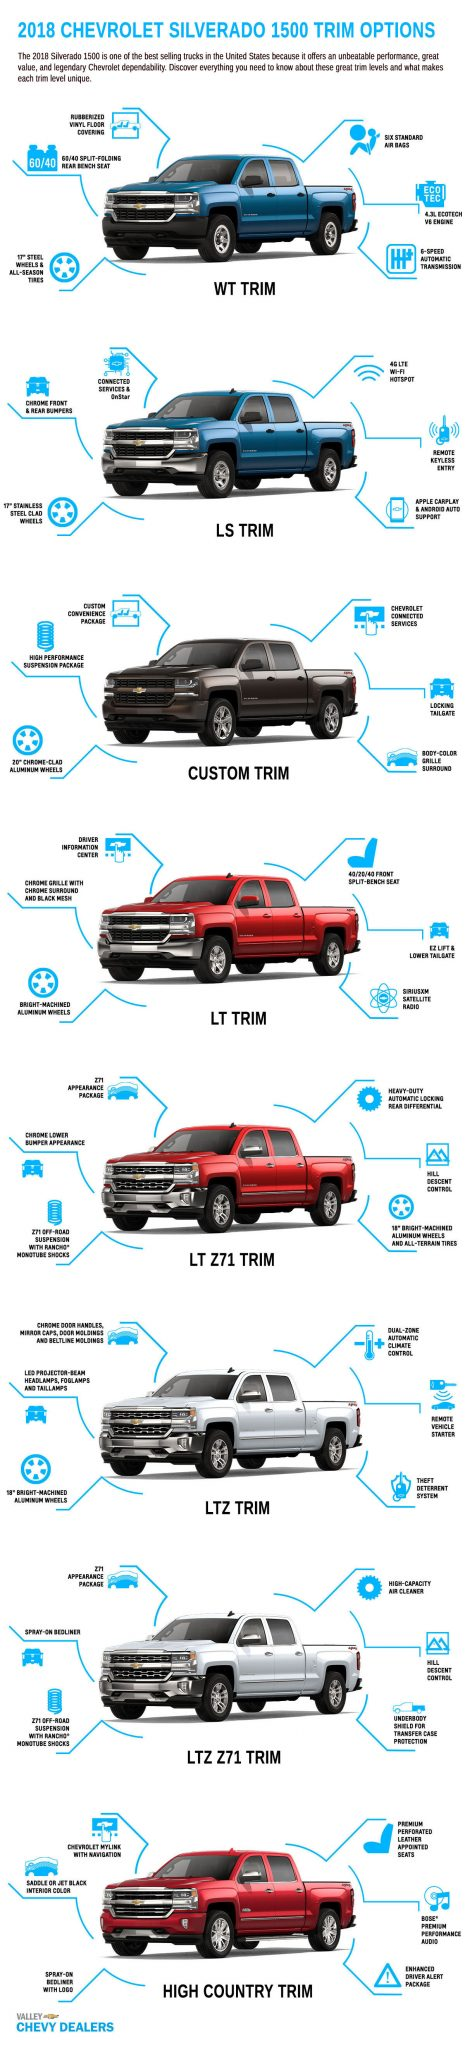 2018 Chevy Silverado 1500 Trims Infographic